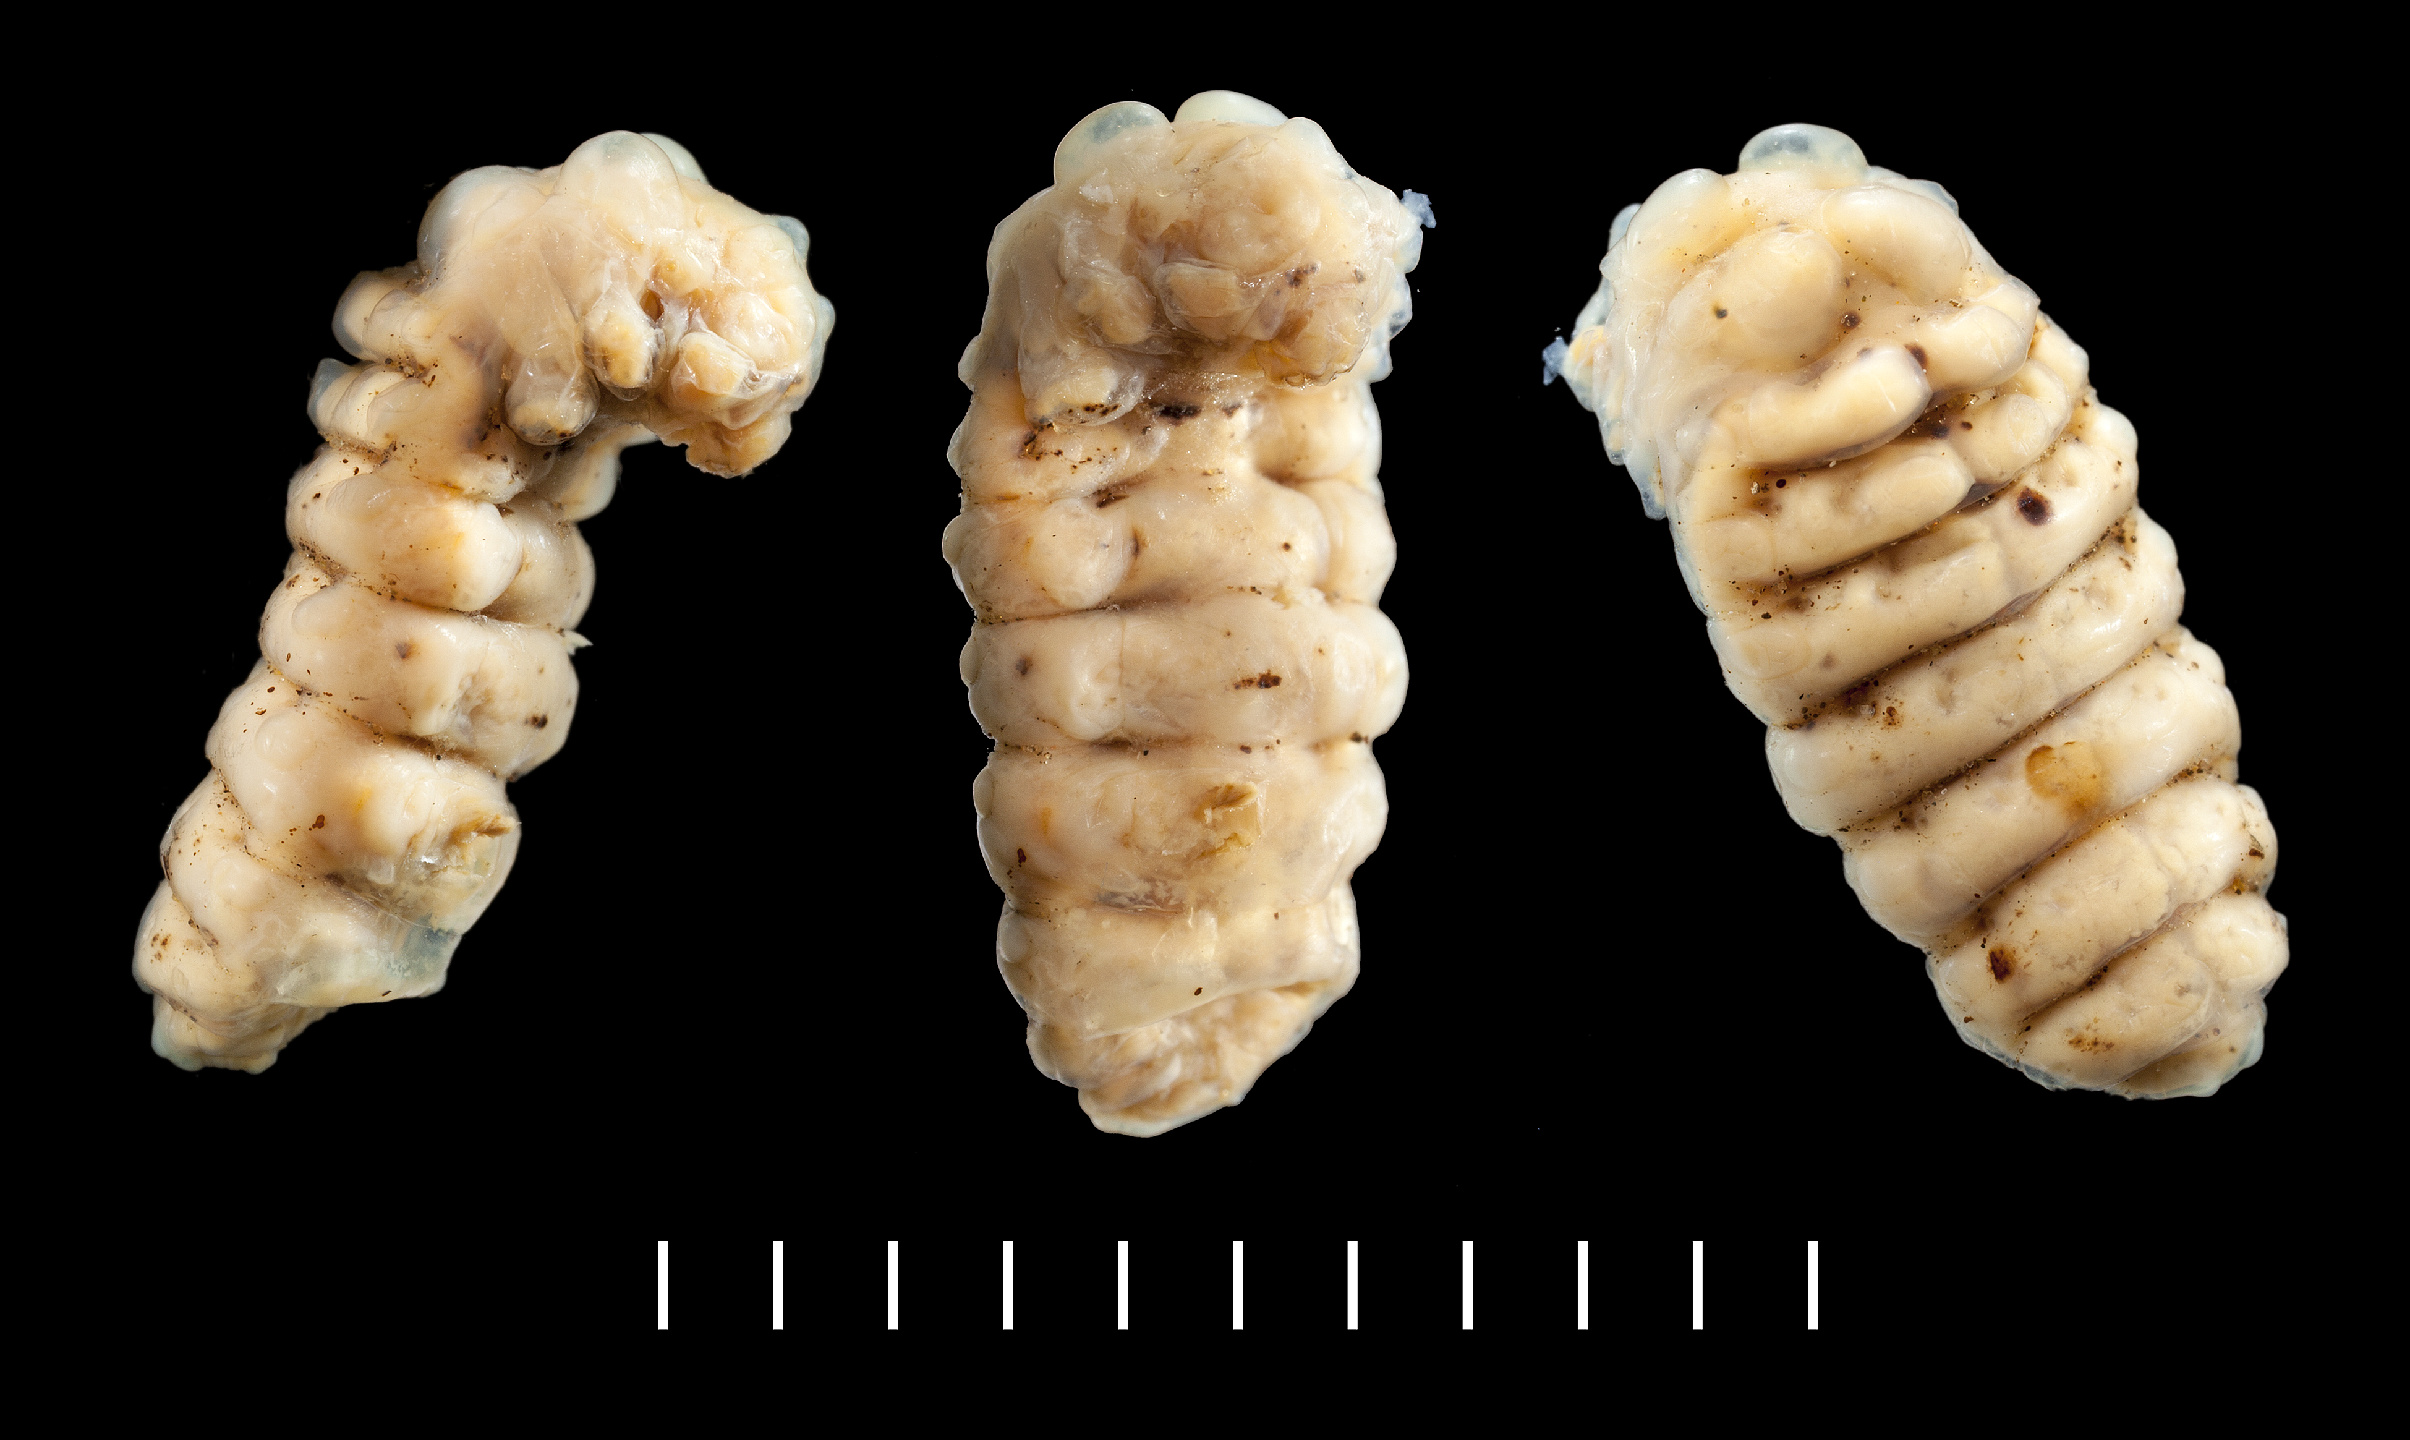 Metoecus paradoxus larva